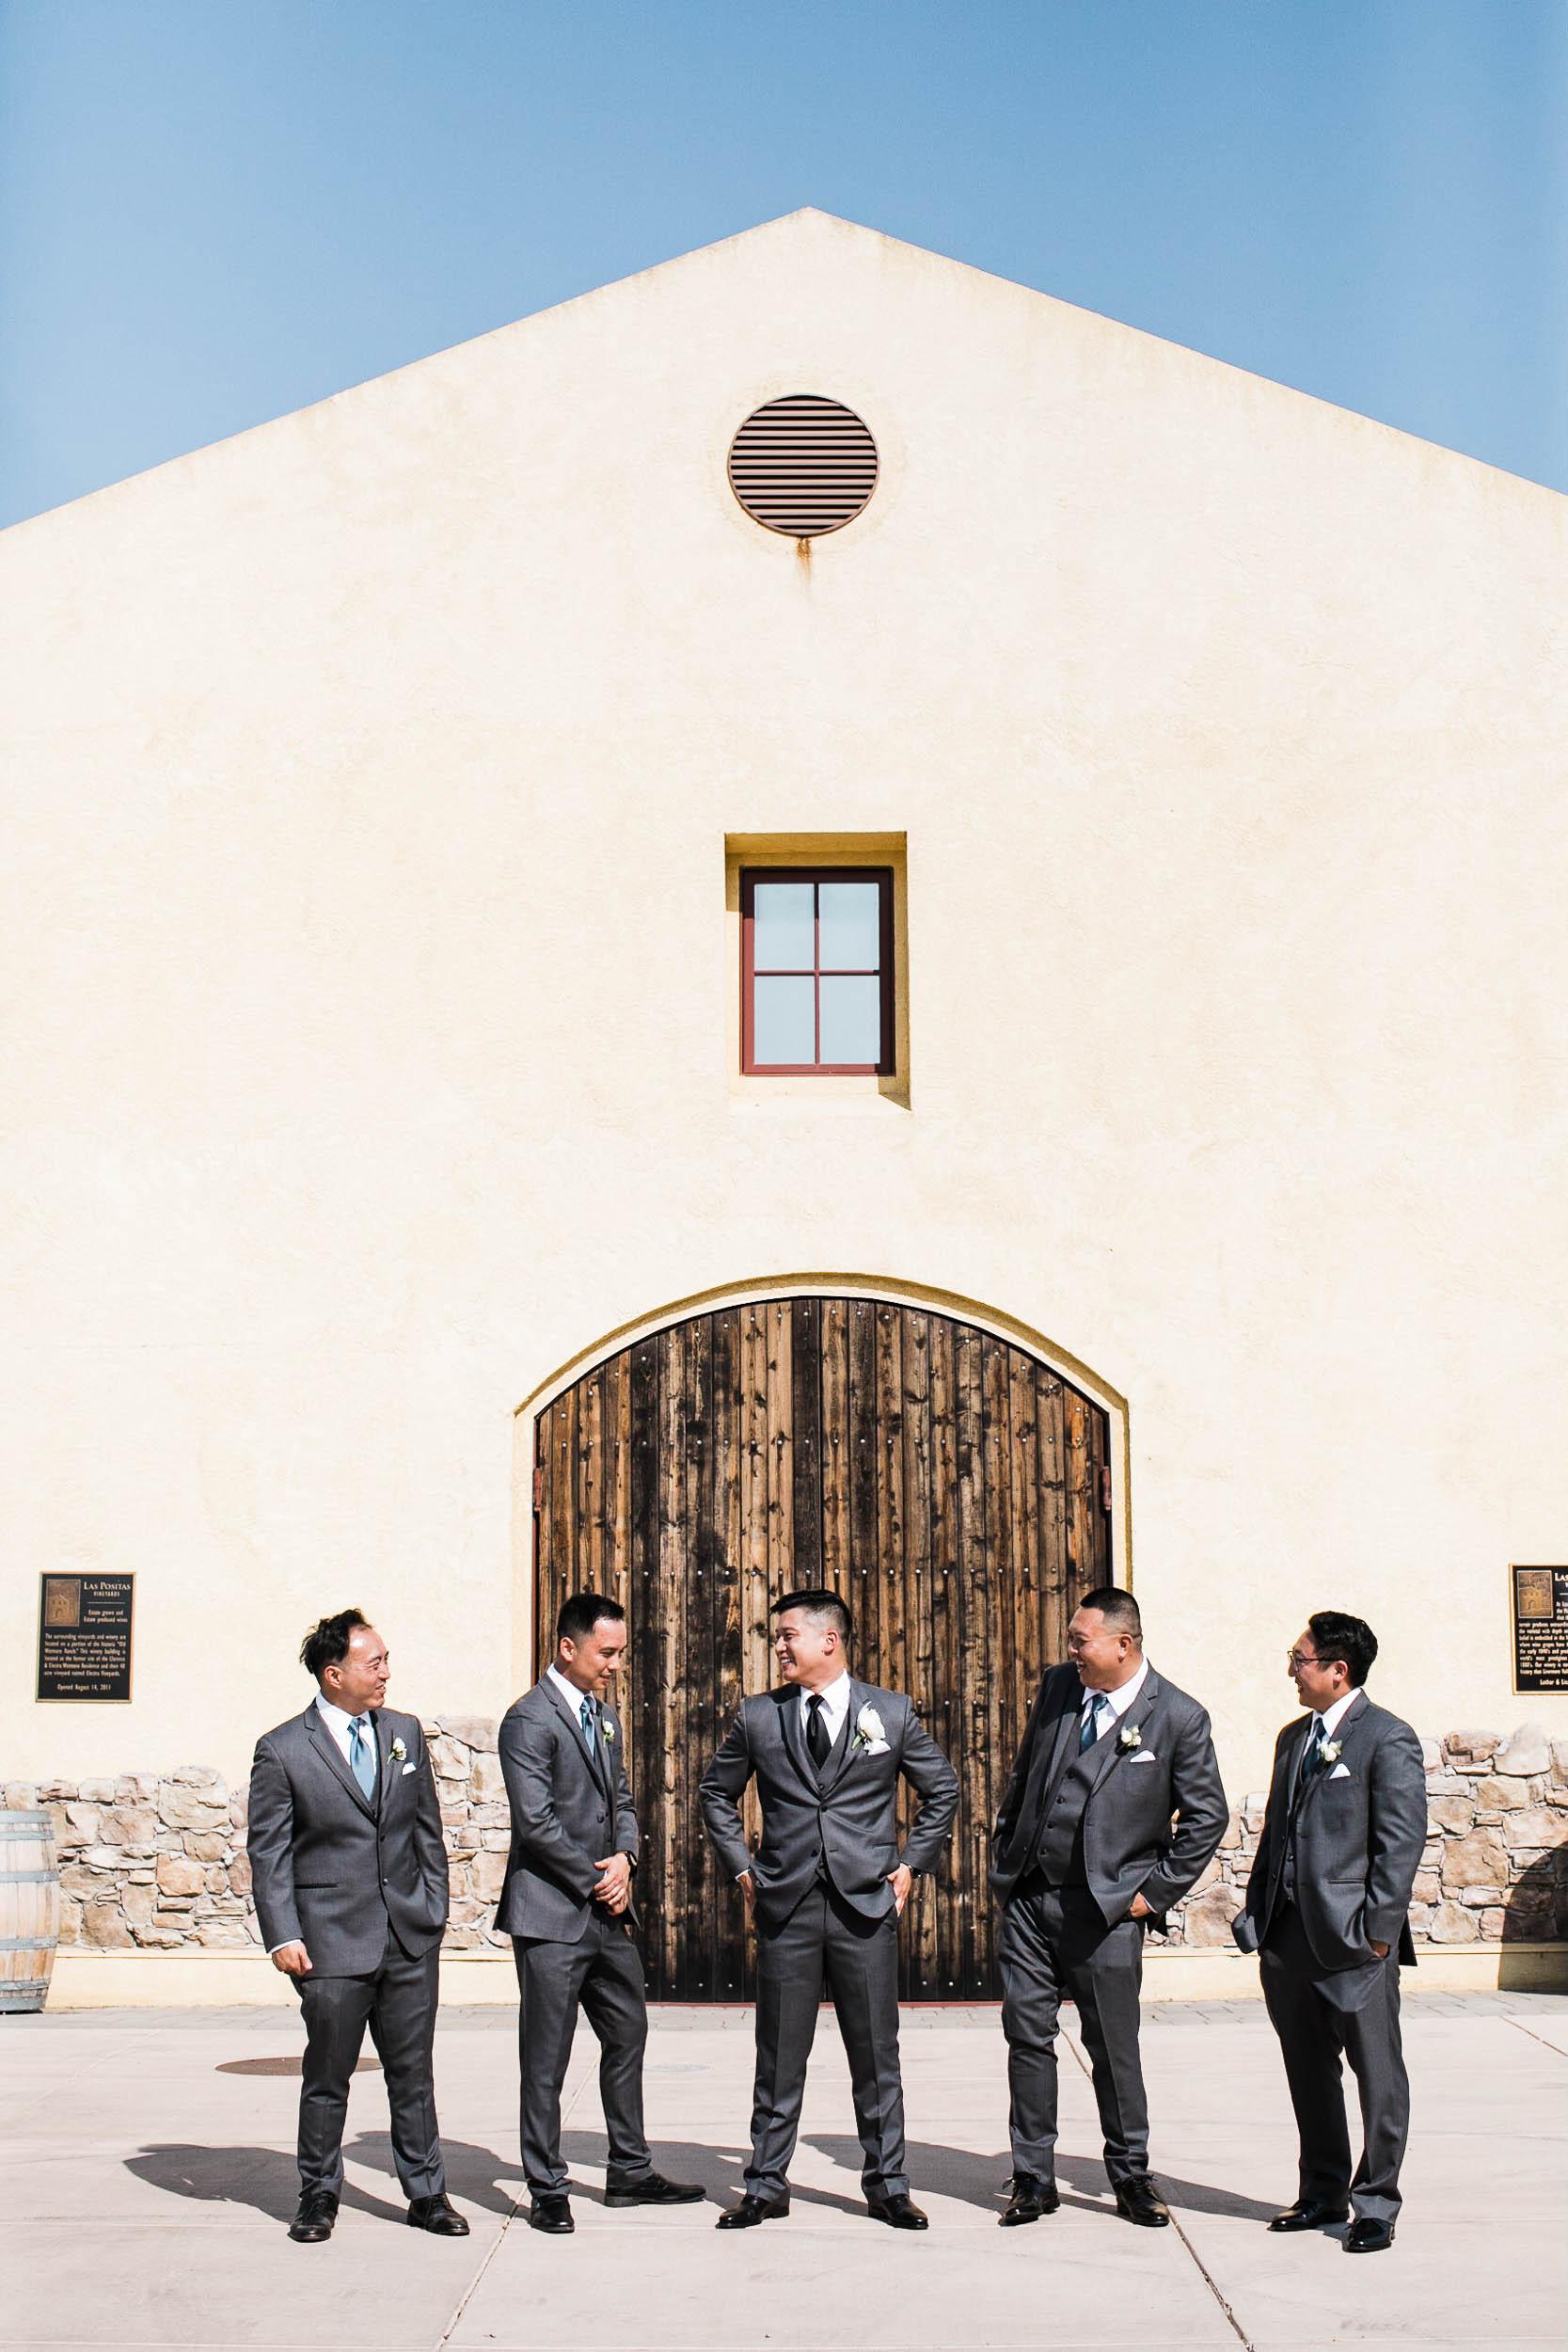 Las Positas Wedding_Buena Lane Photography_090118ER254.jpg